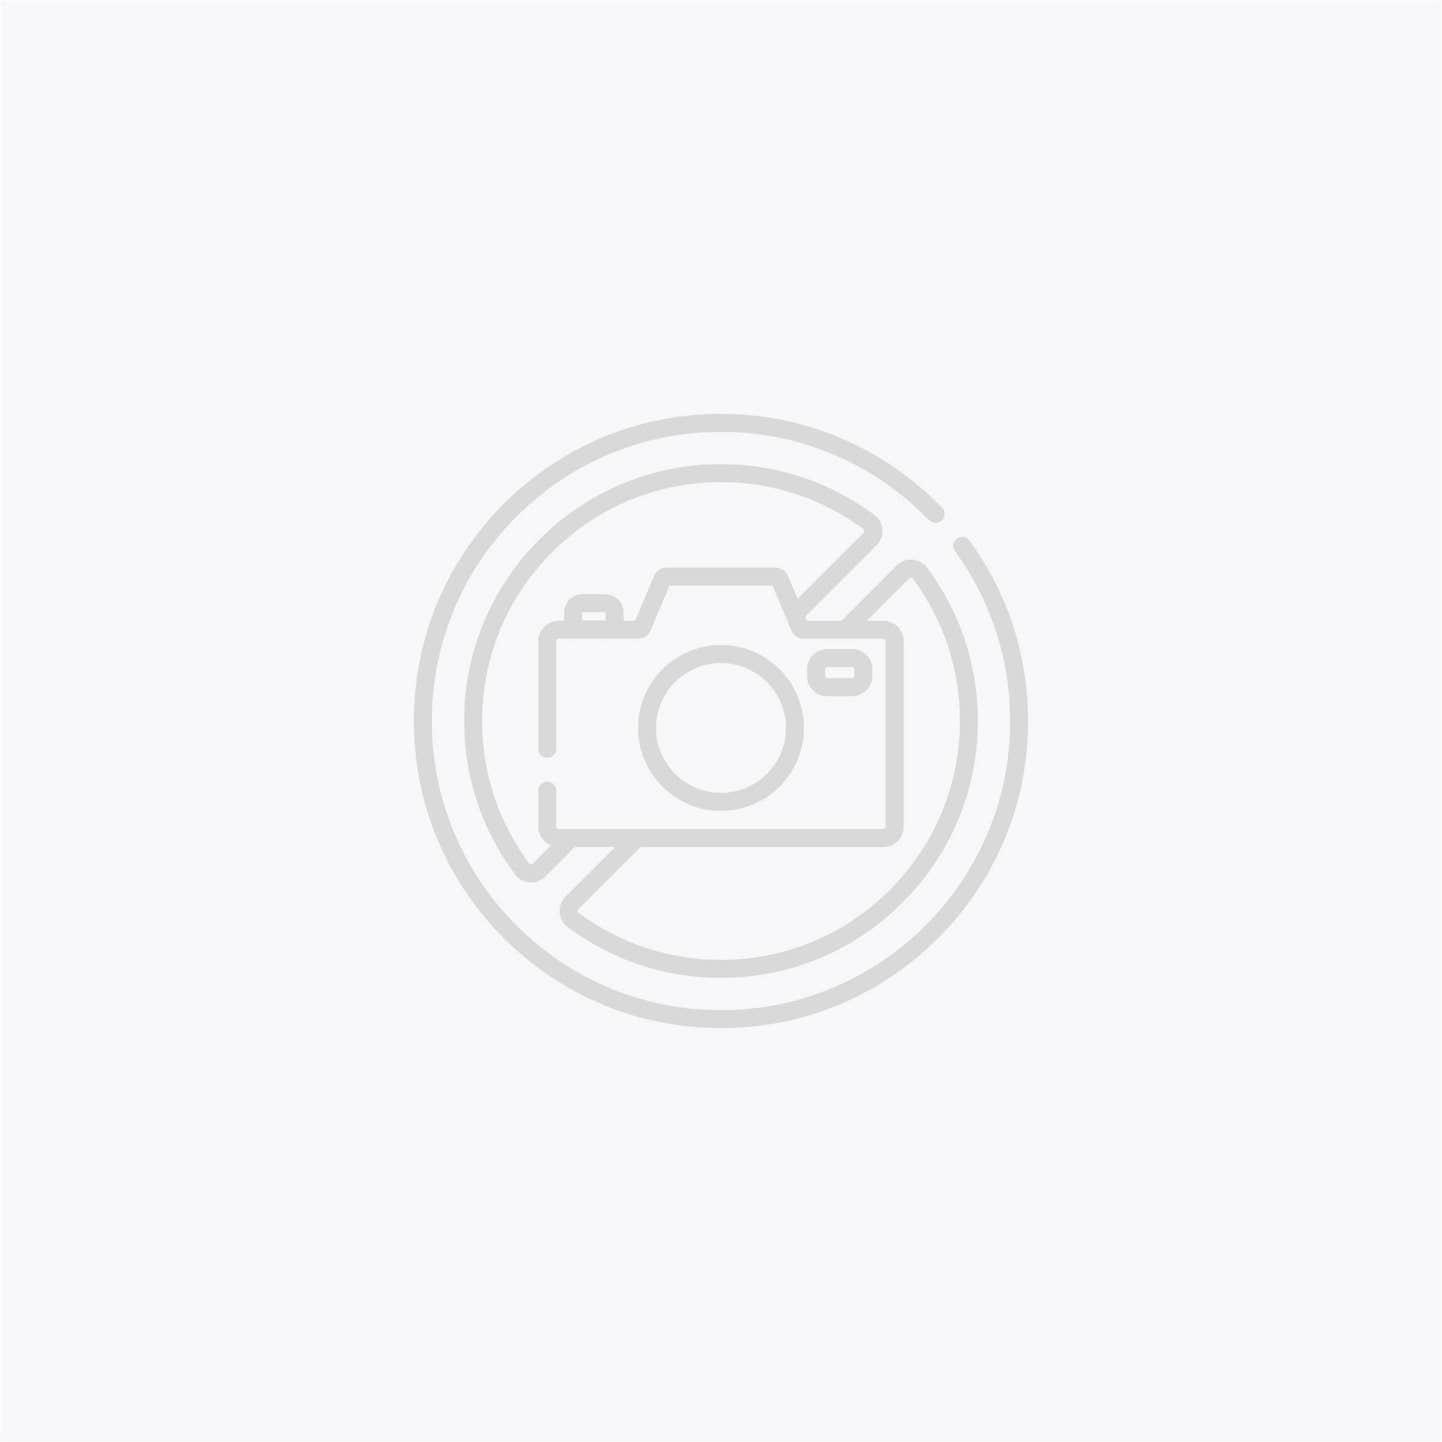 Delvaux Tempête GM Toile de Crin Polo Flamingo for the best price at Labellov secondhand luxury